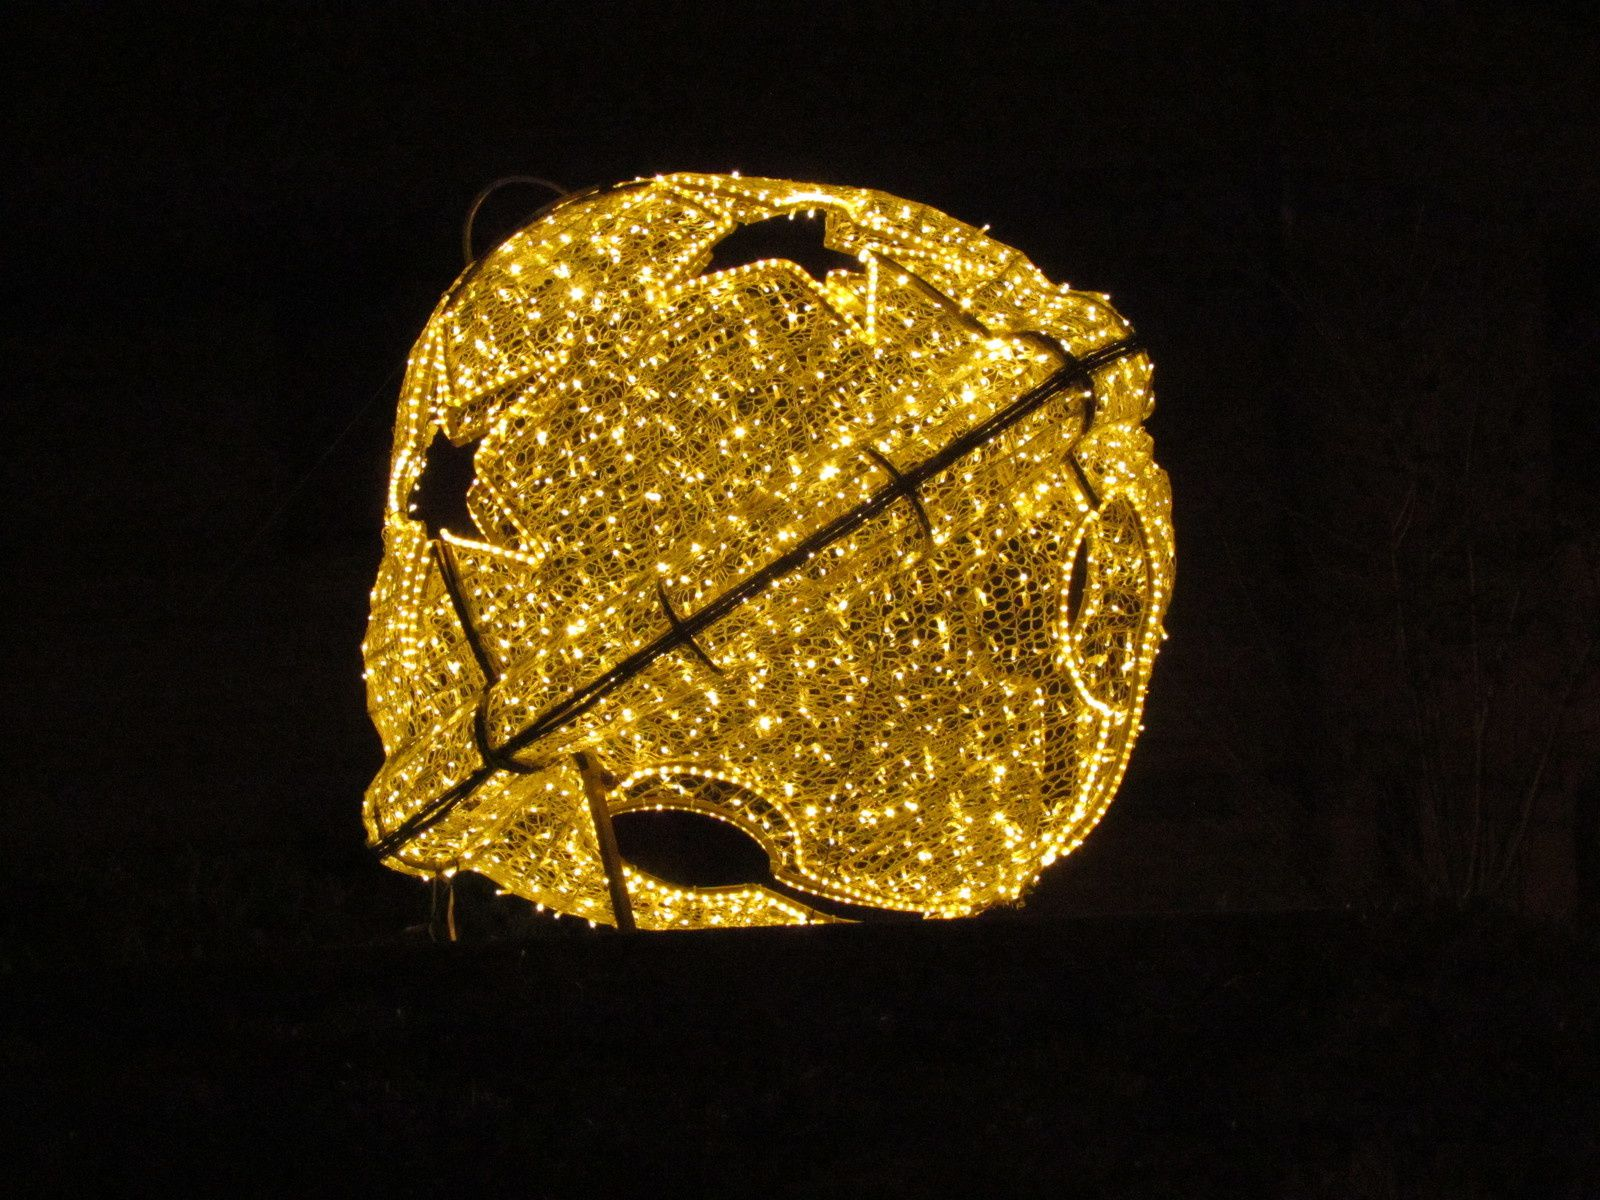 Les illuminations chestrolaises